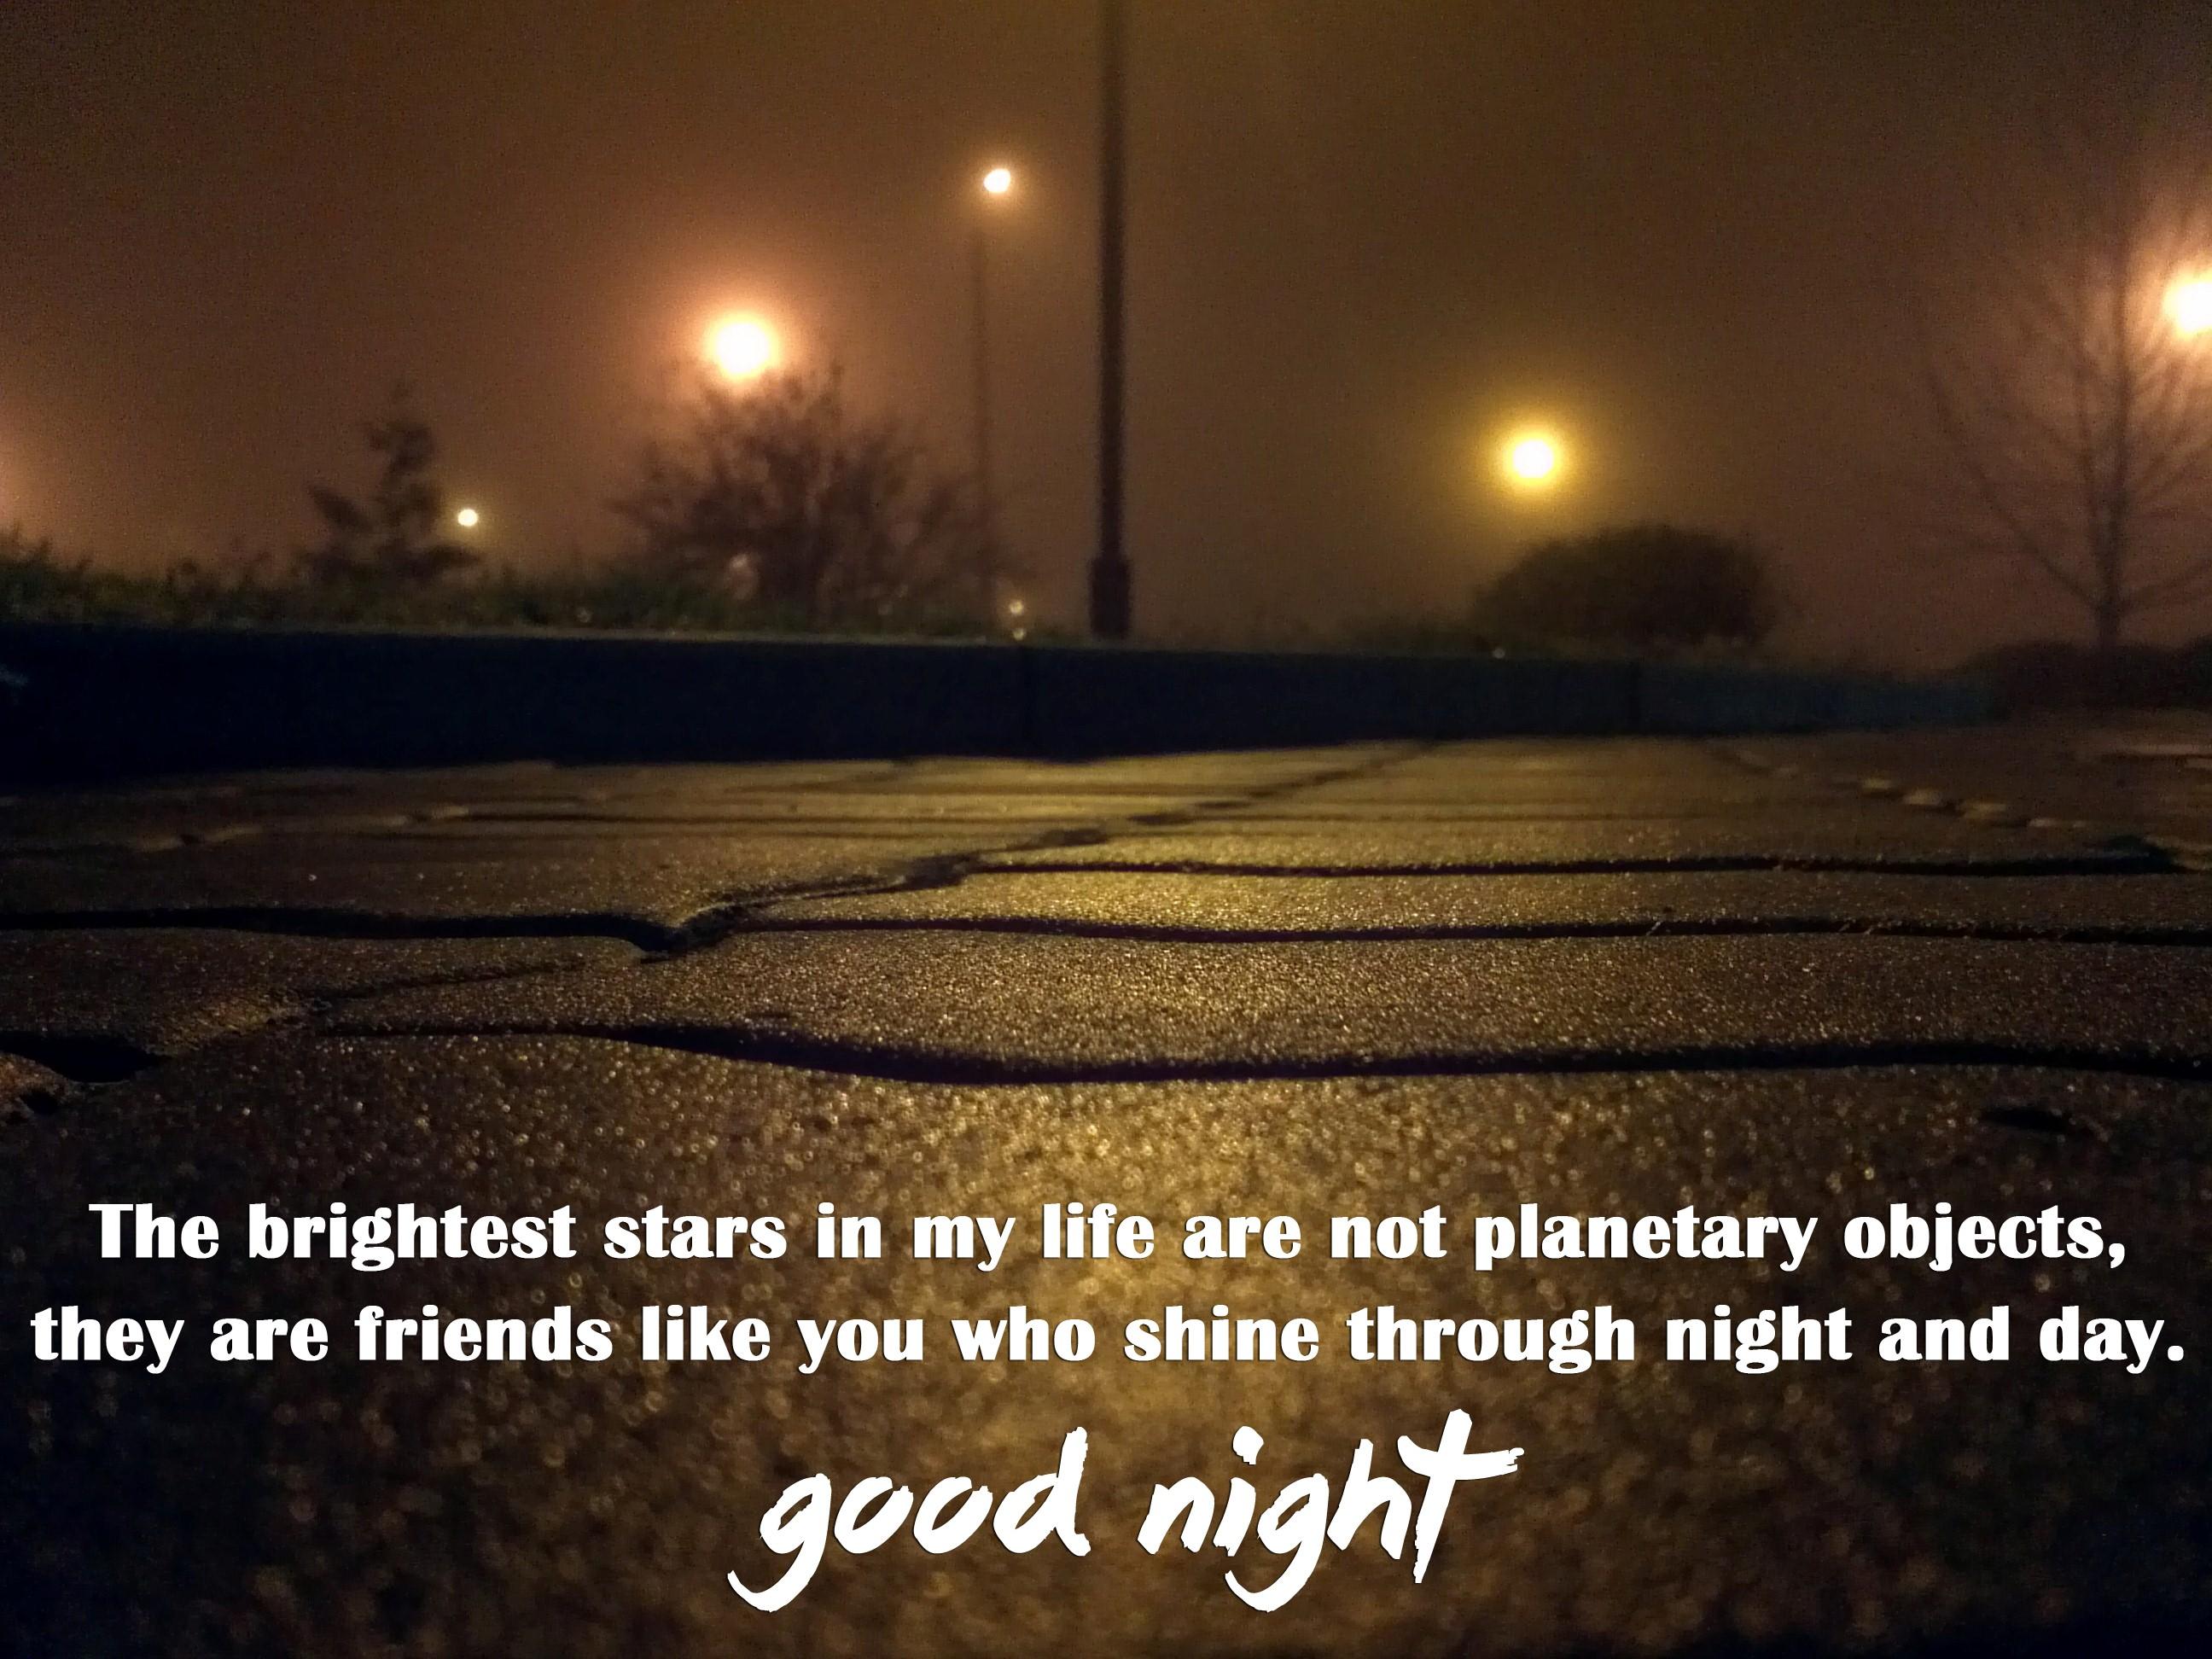 Good Night Friends Quote Hd Desktop Background Wallpapers - Life Good Night Hd Quotes - HD Wallpaper